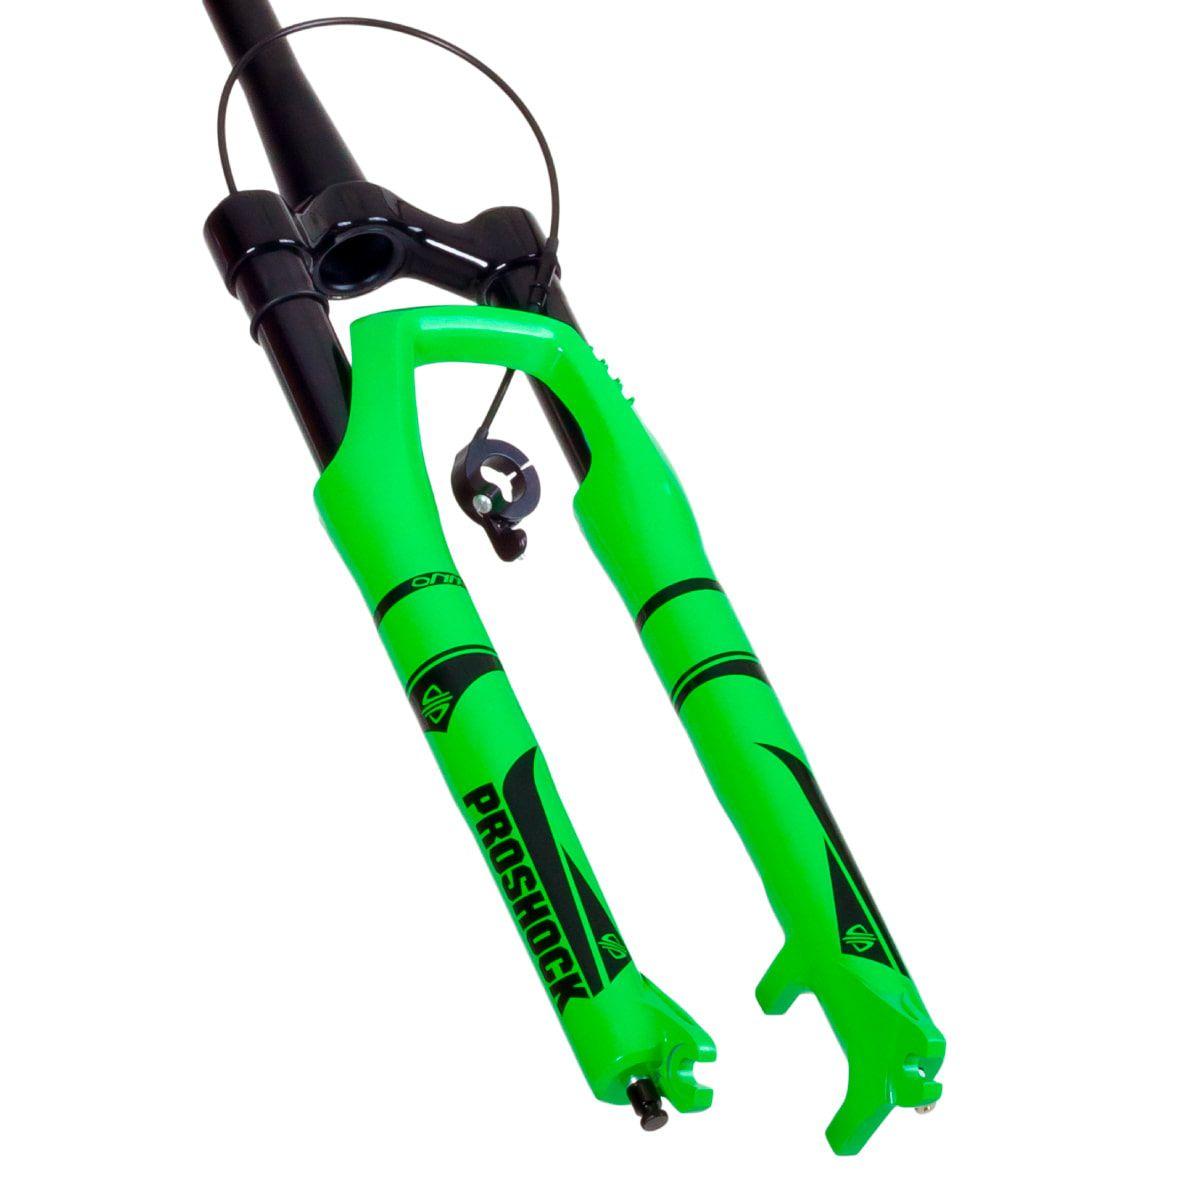 Suspensão Proshock Onix Colors Aro 29 Verde